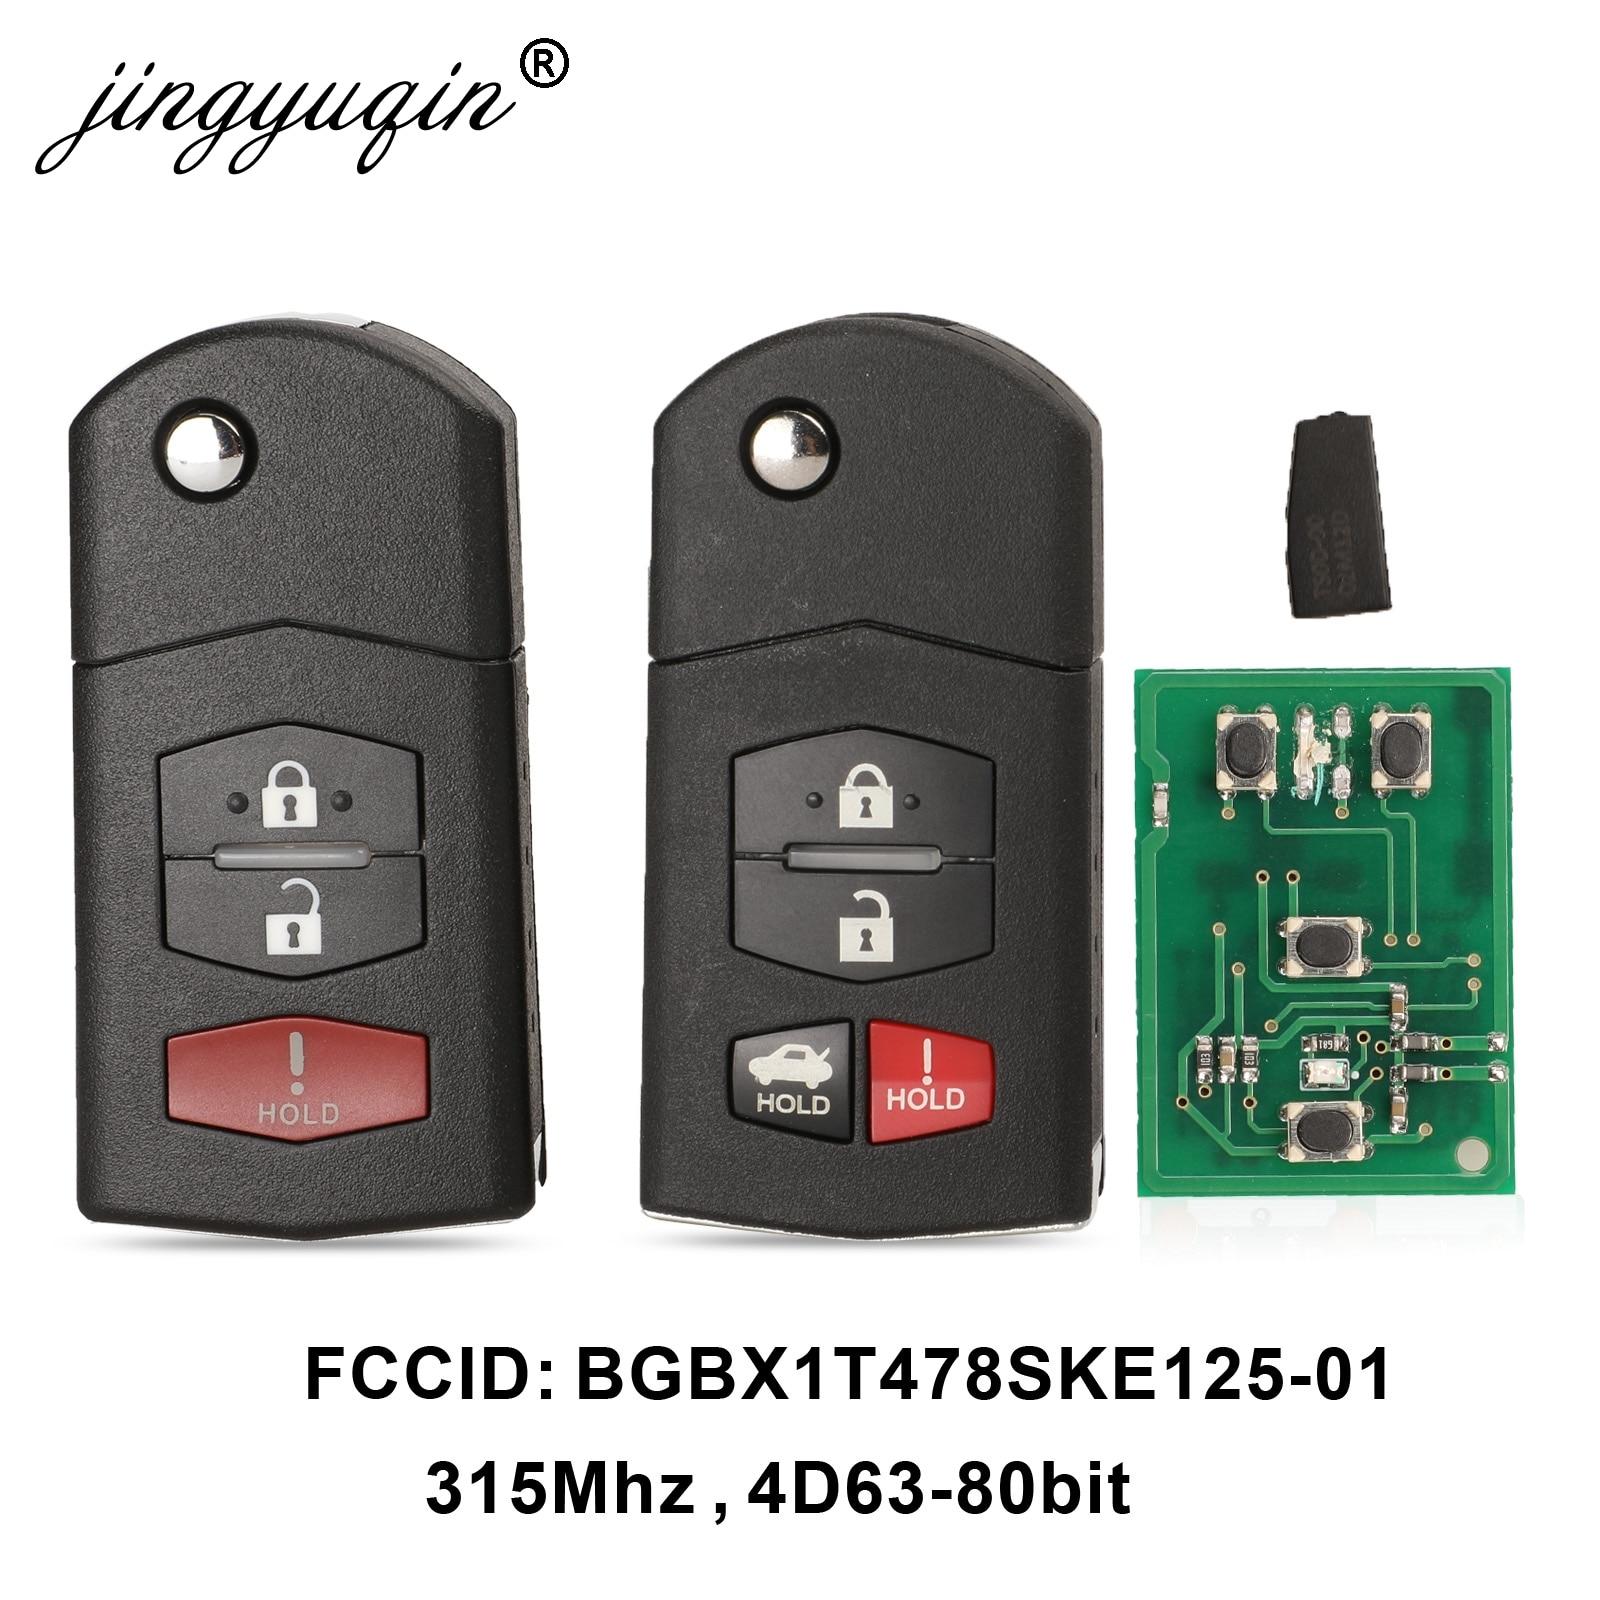 Jingyuqin 3/4 Buttons Remote Folding Car Key 315Mhz For Mazda 3 5 6 CX-7 CX-9 MX-5 Miata BGBX1T478SKE125-01 4D63 Chip Fob